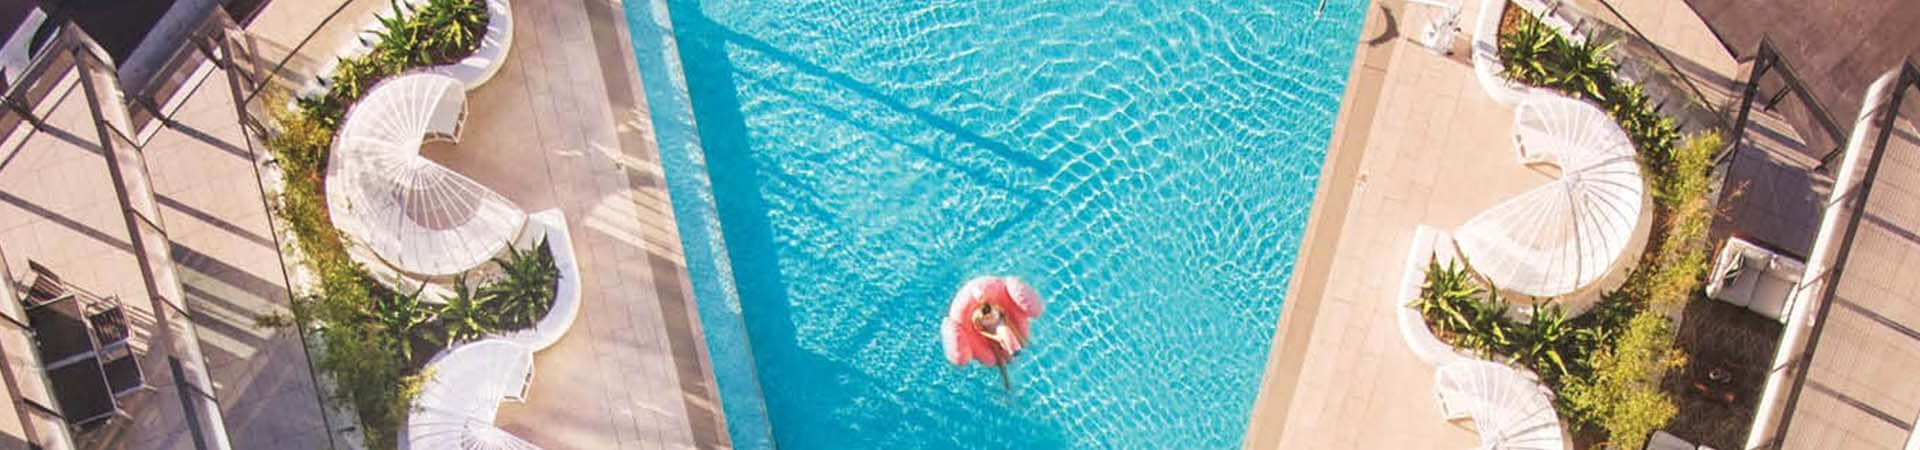 swimming-pools-spa-sauna-strata